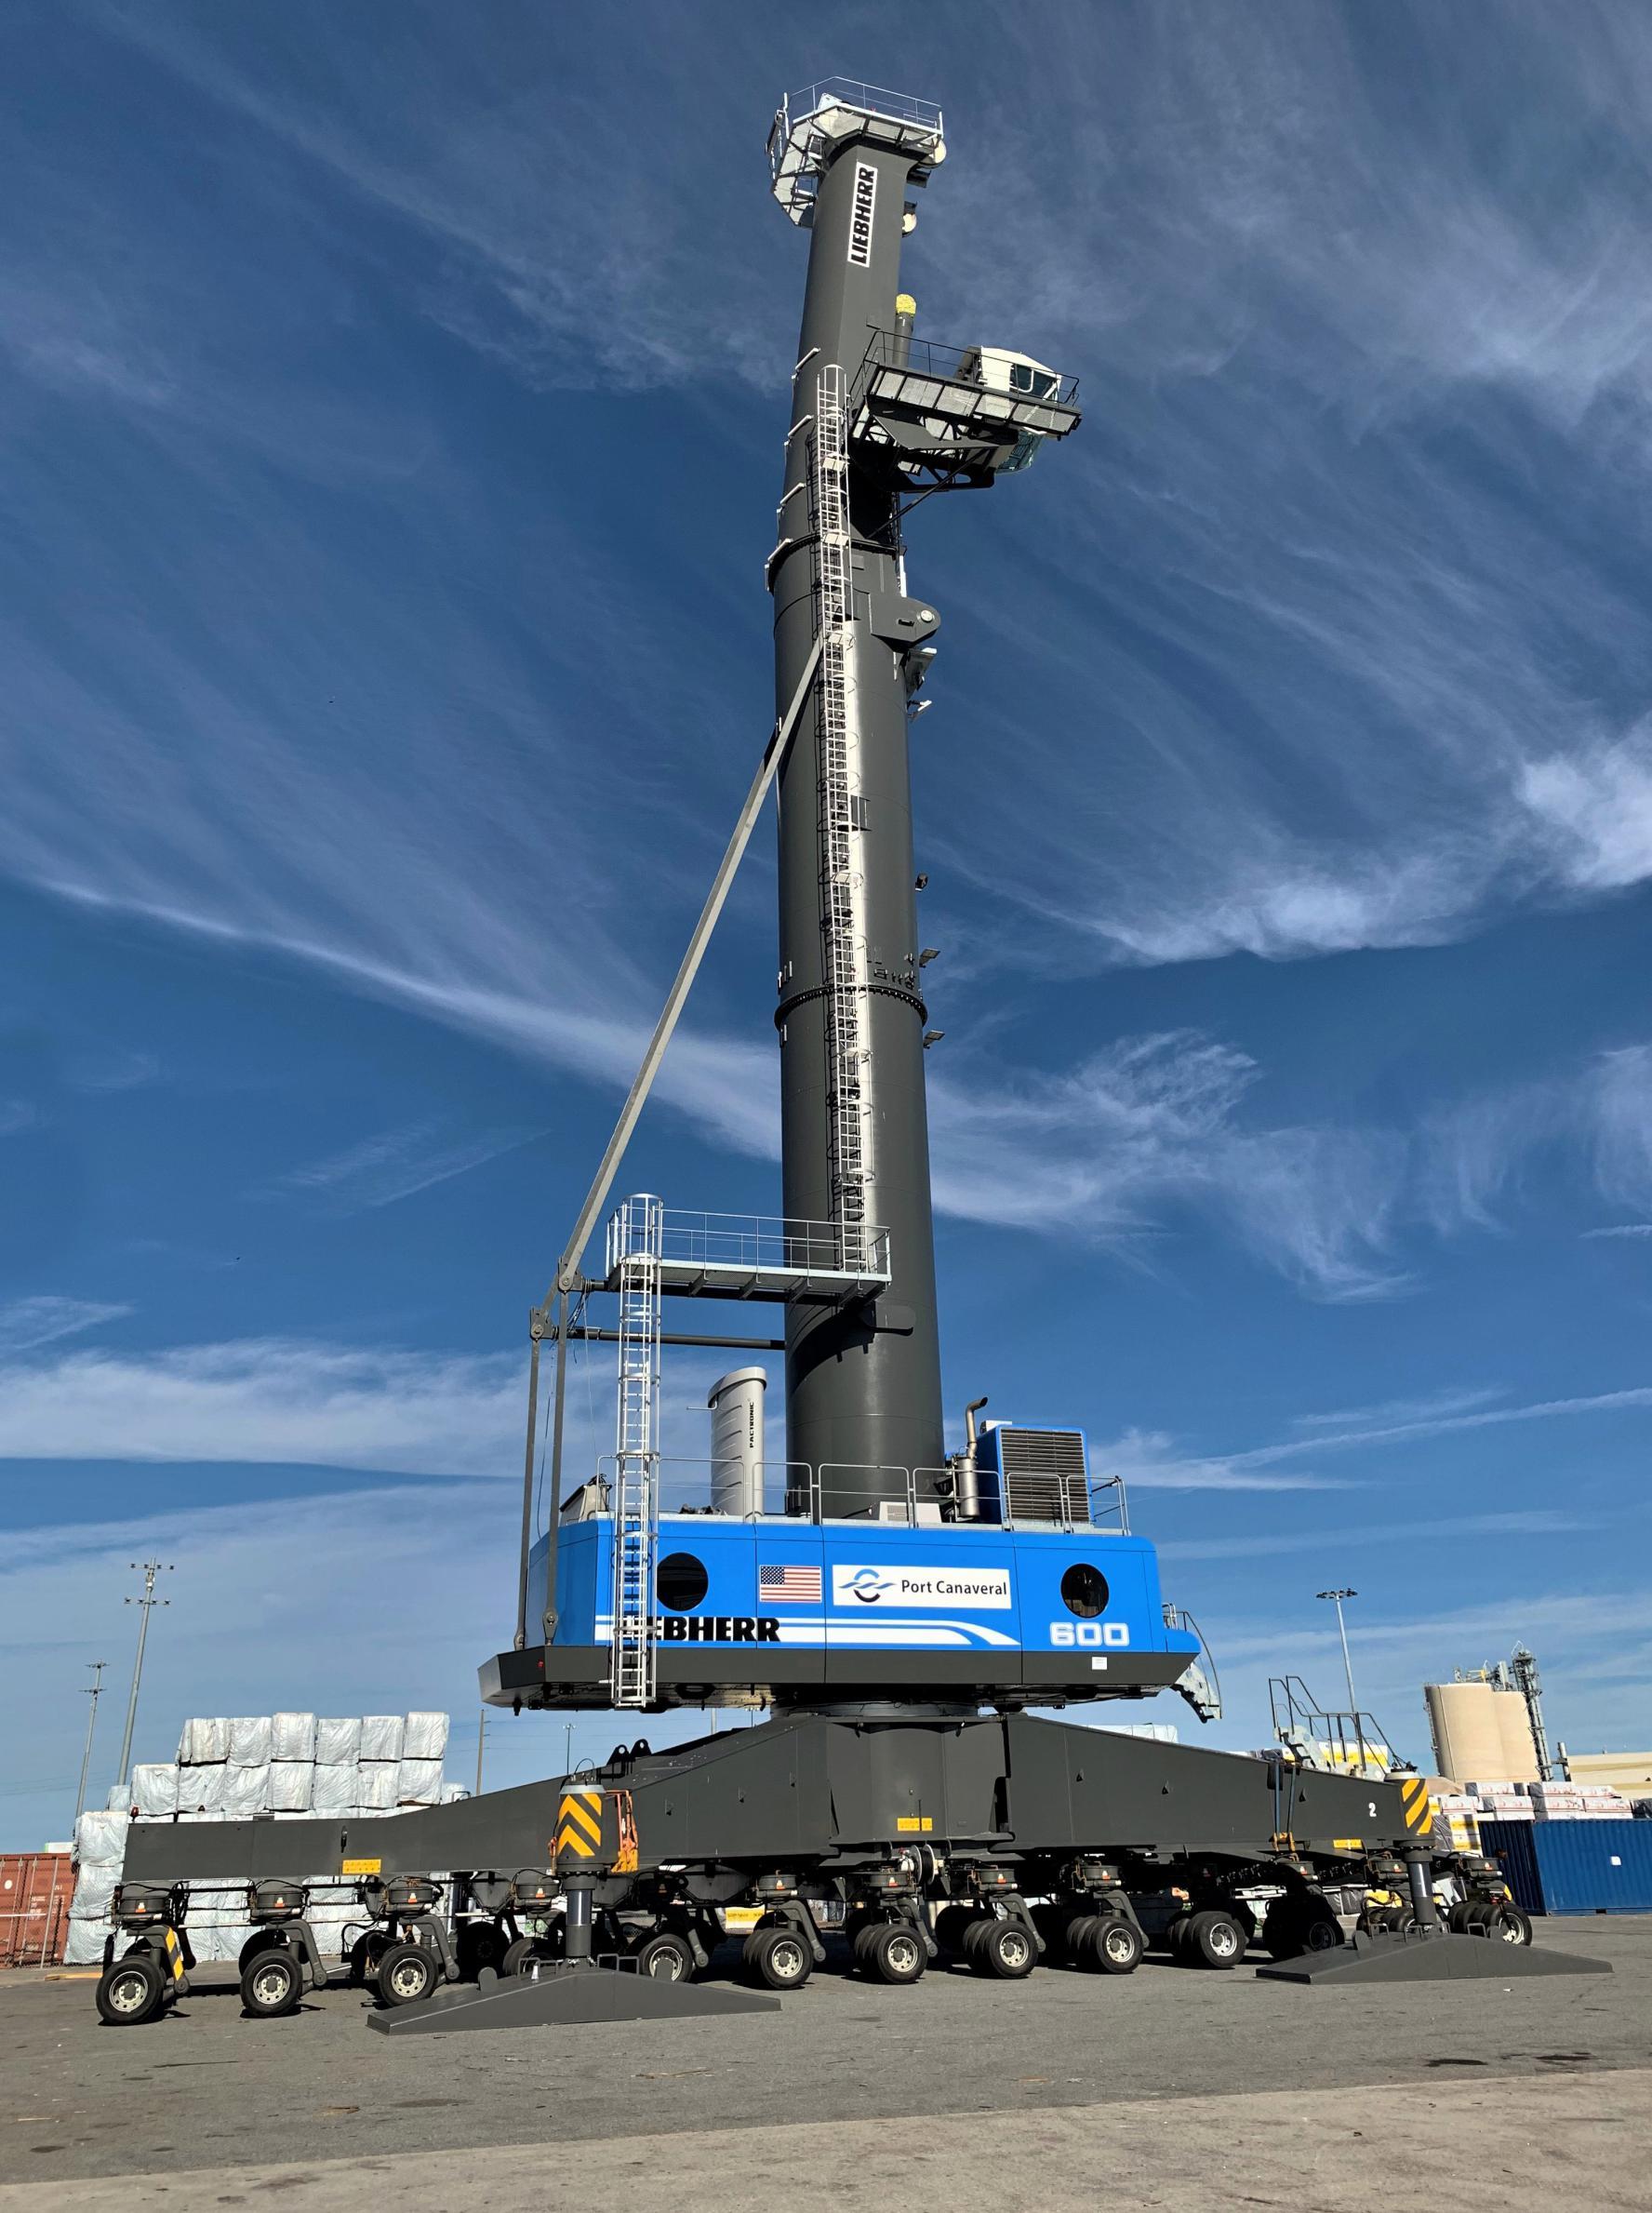 Liebherr LHM 600 crane Port Canaveral 011819 (Port Canaveral) 2(c)